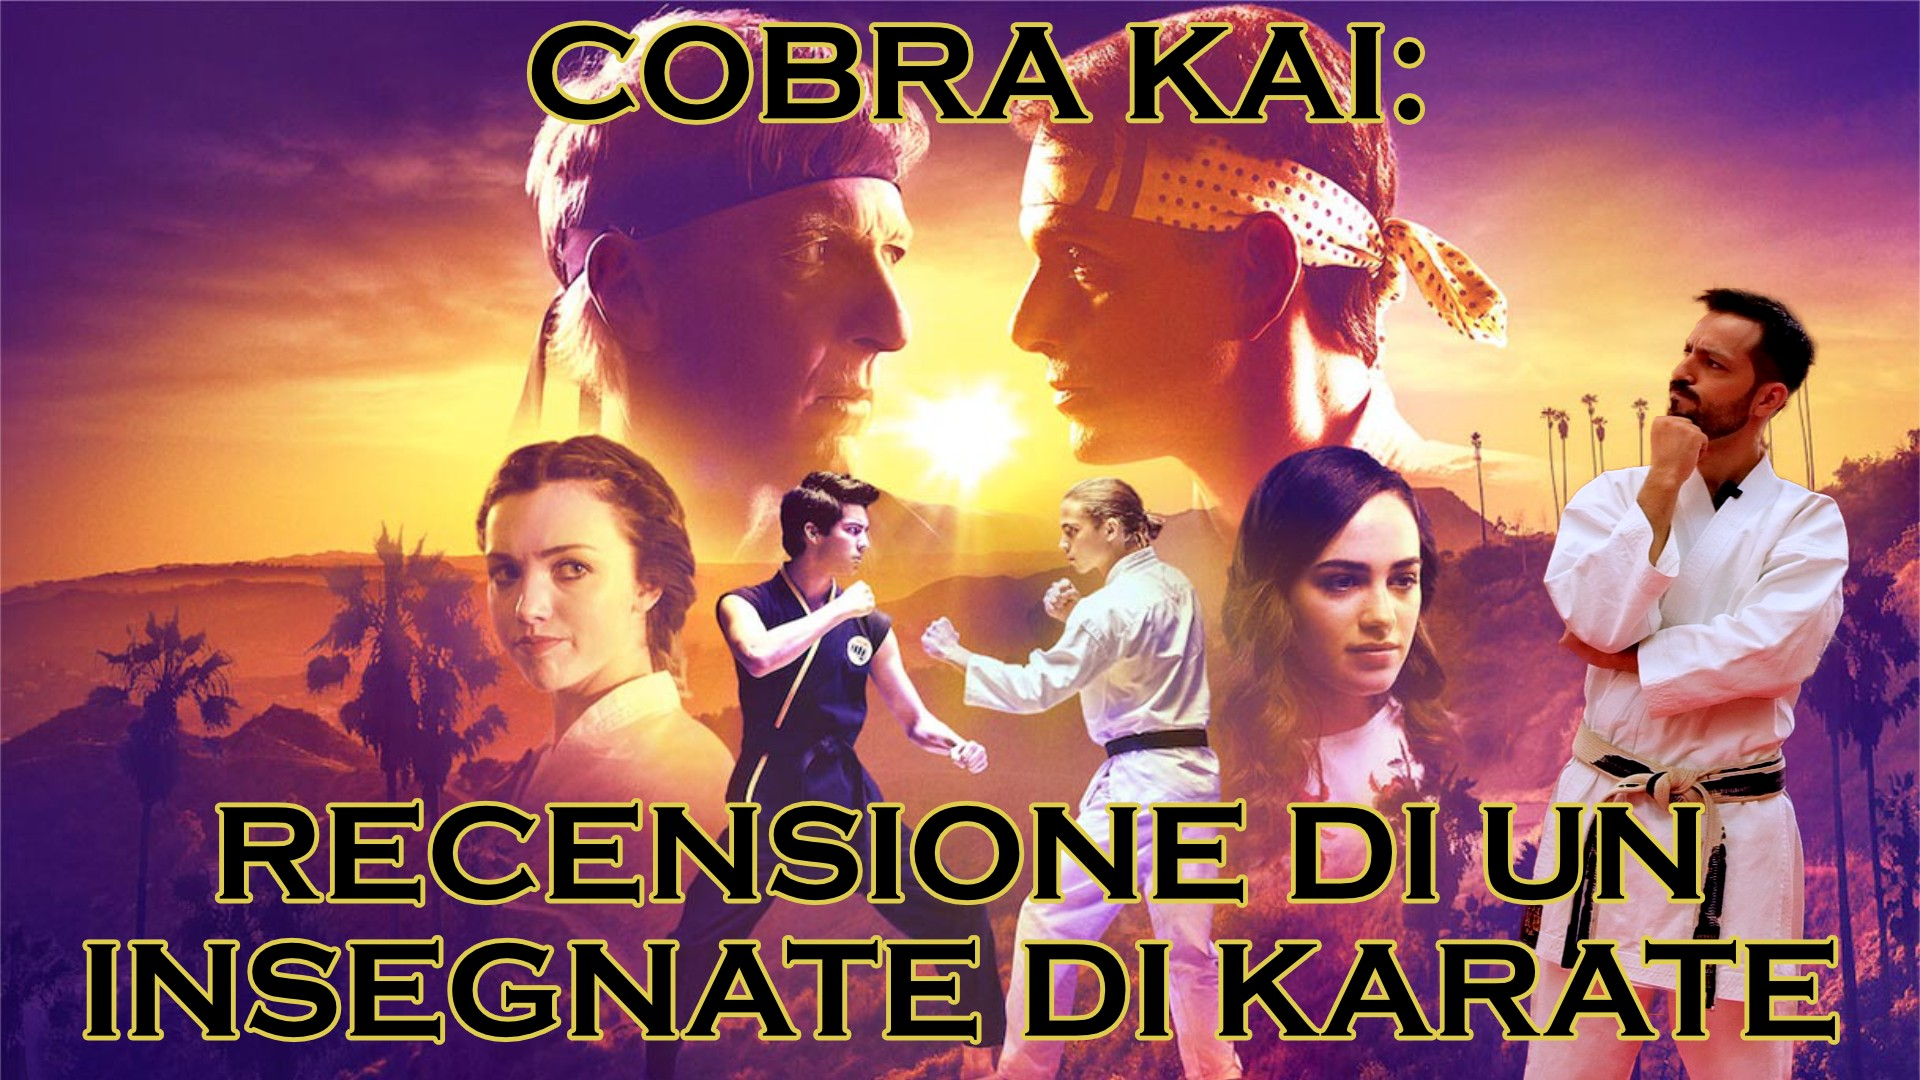 Cobra Kai: la recensione di un insegnate di karate